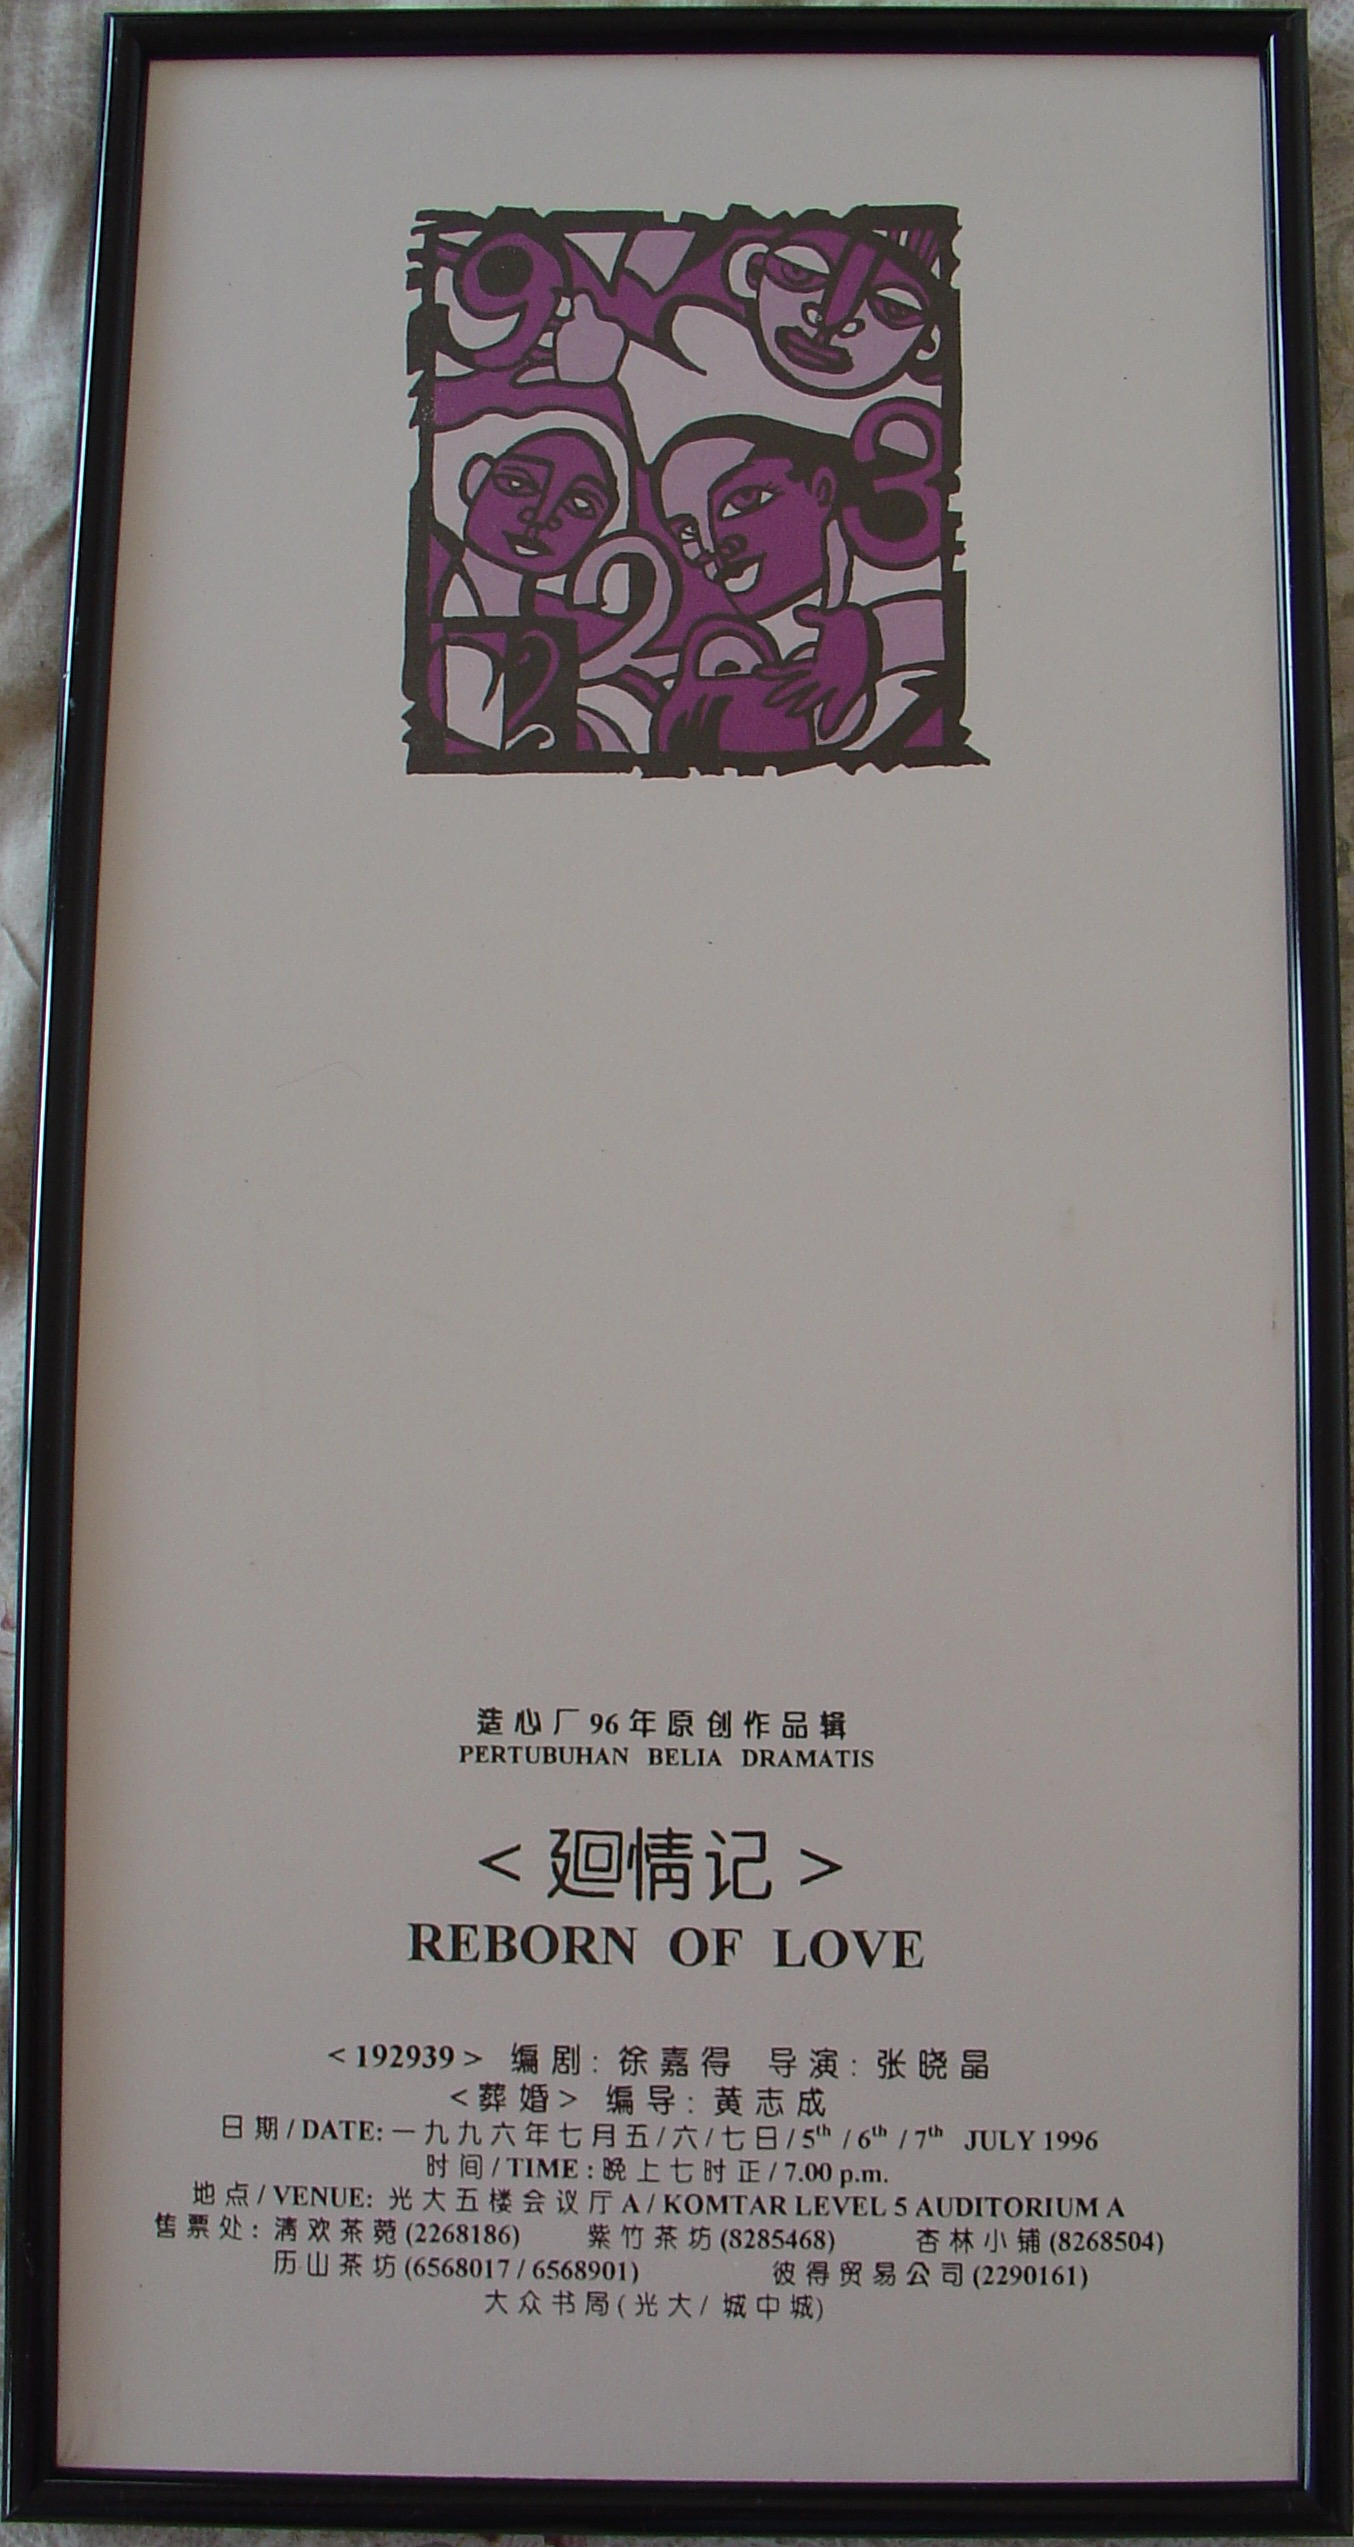 1996 Reborn Of Love Poster